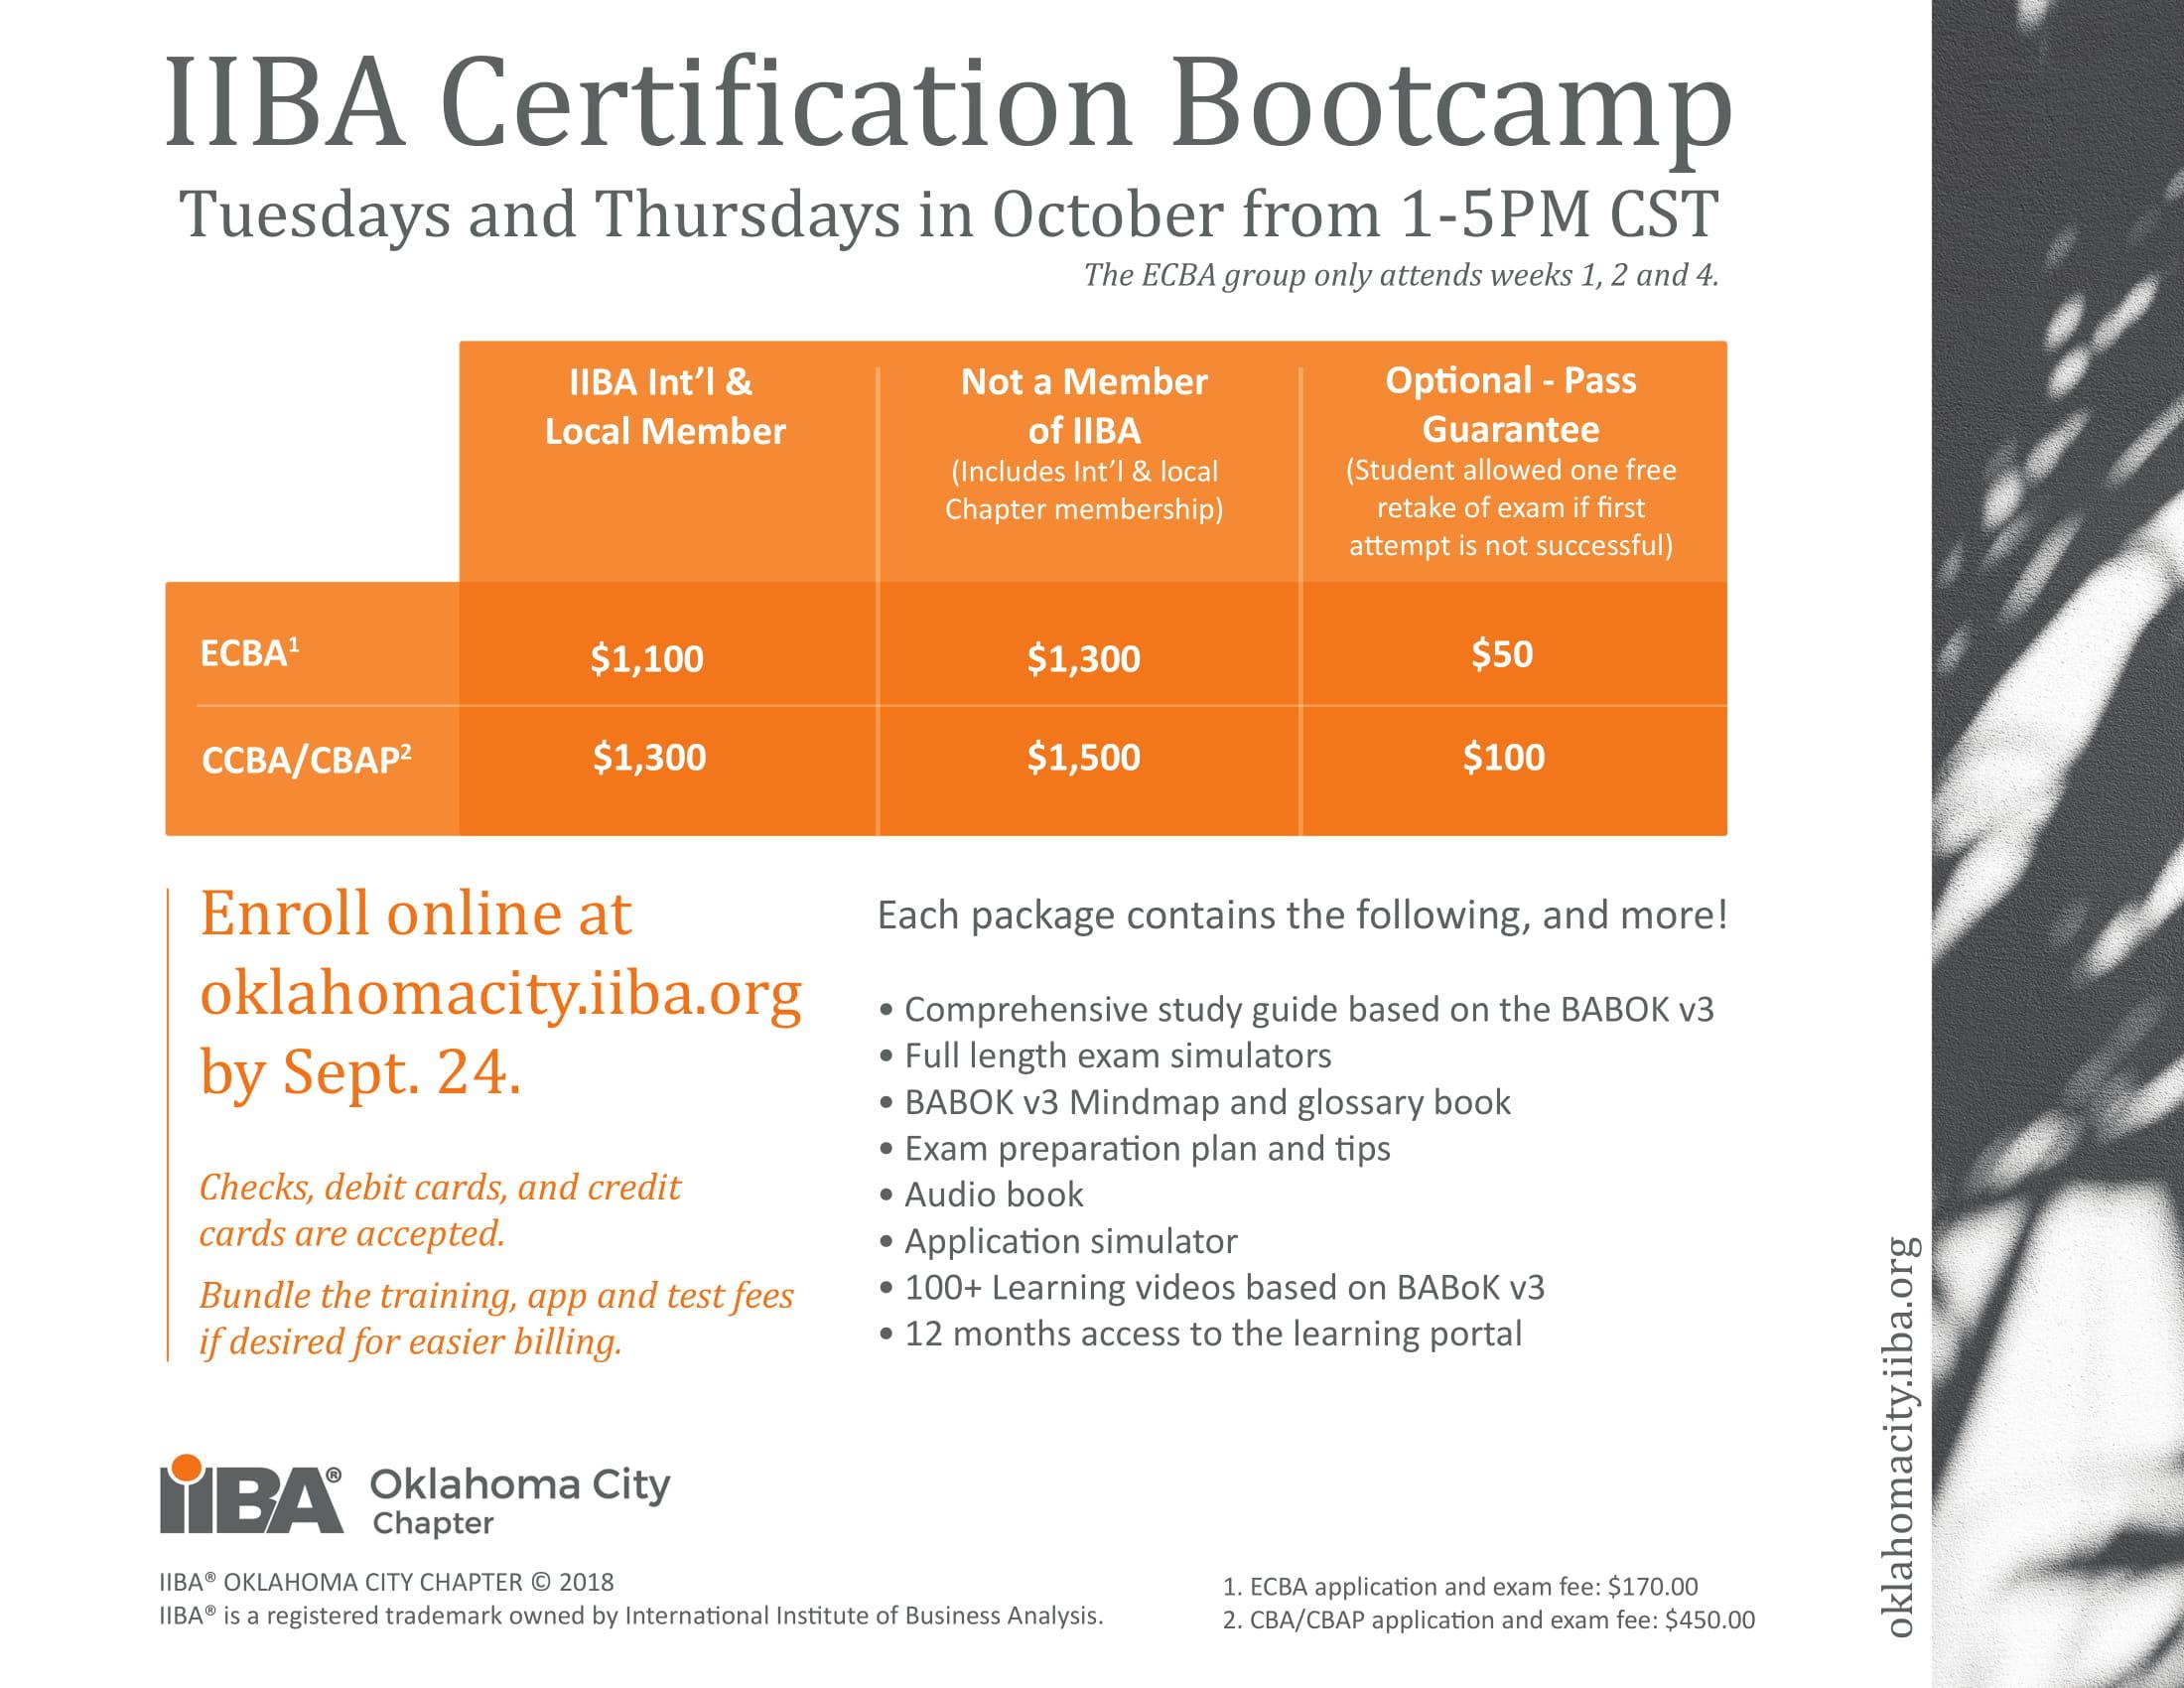 certification iiba camp boot fall bootcamp okc m44 bmw synopsis oklahomacity